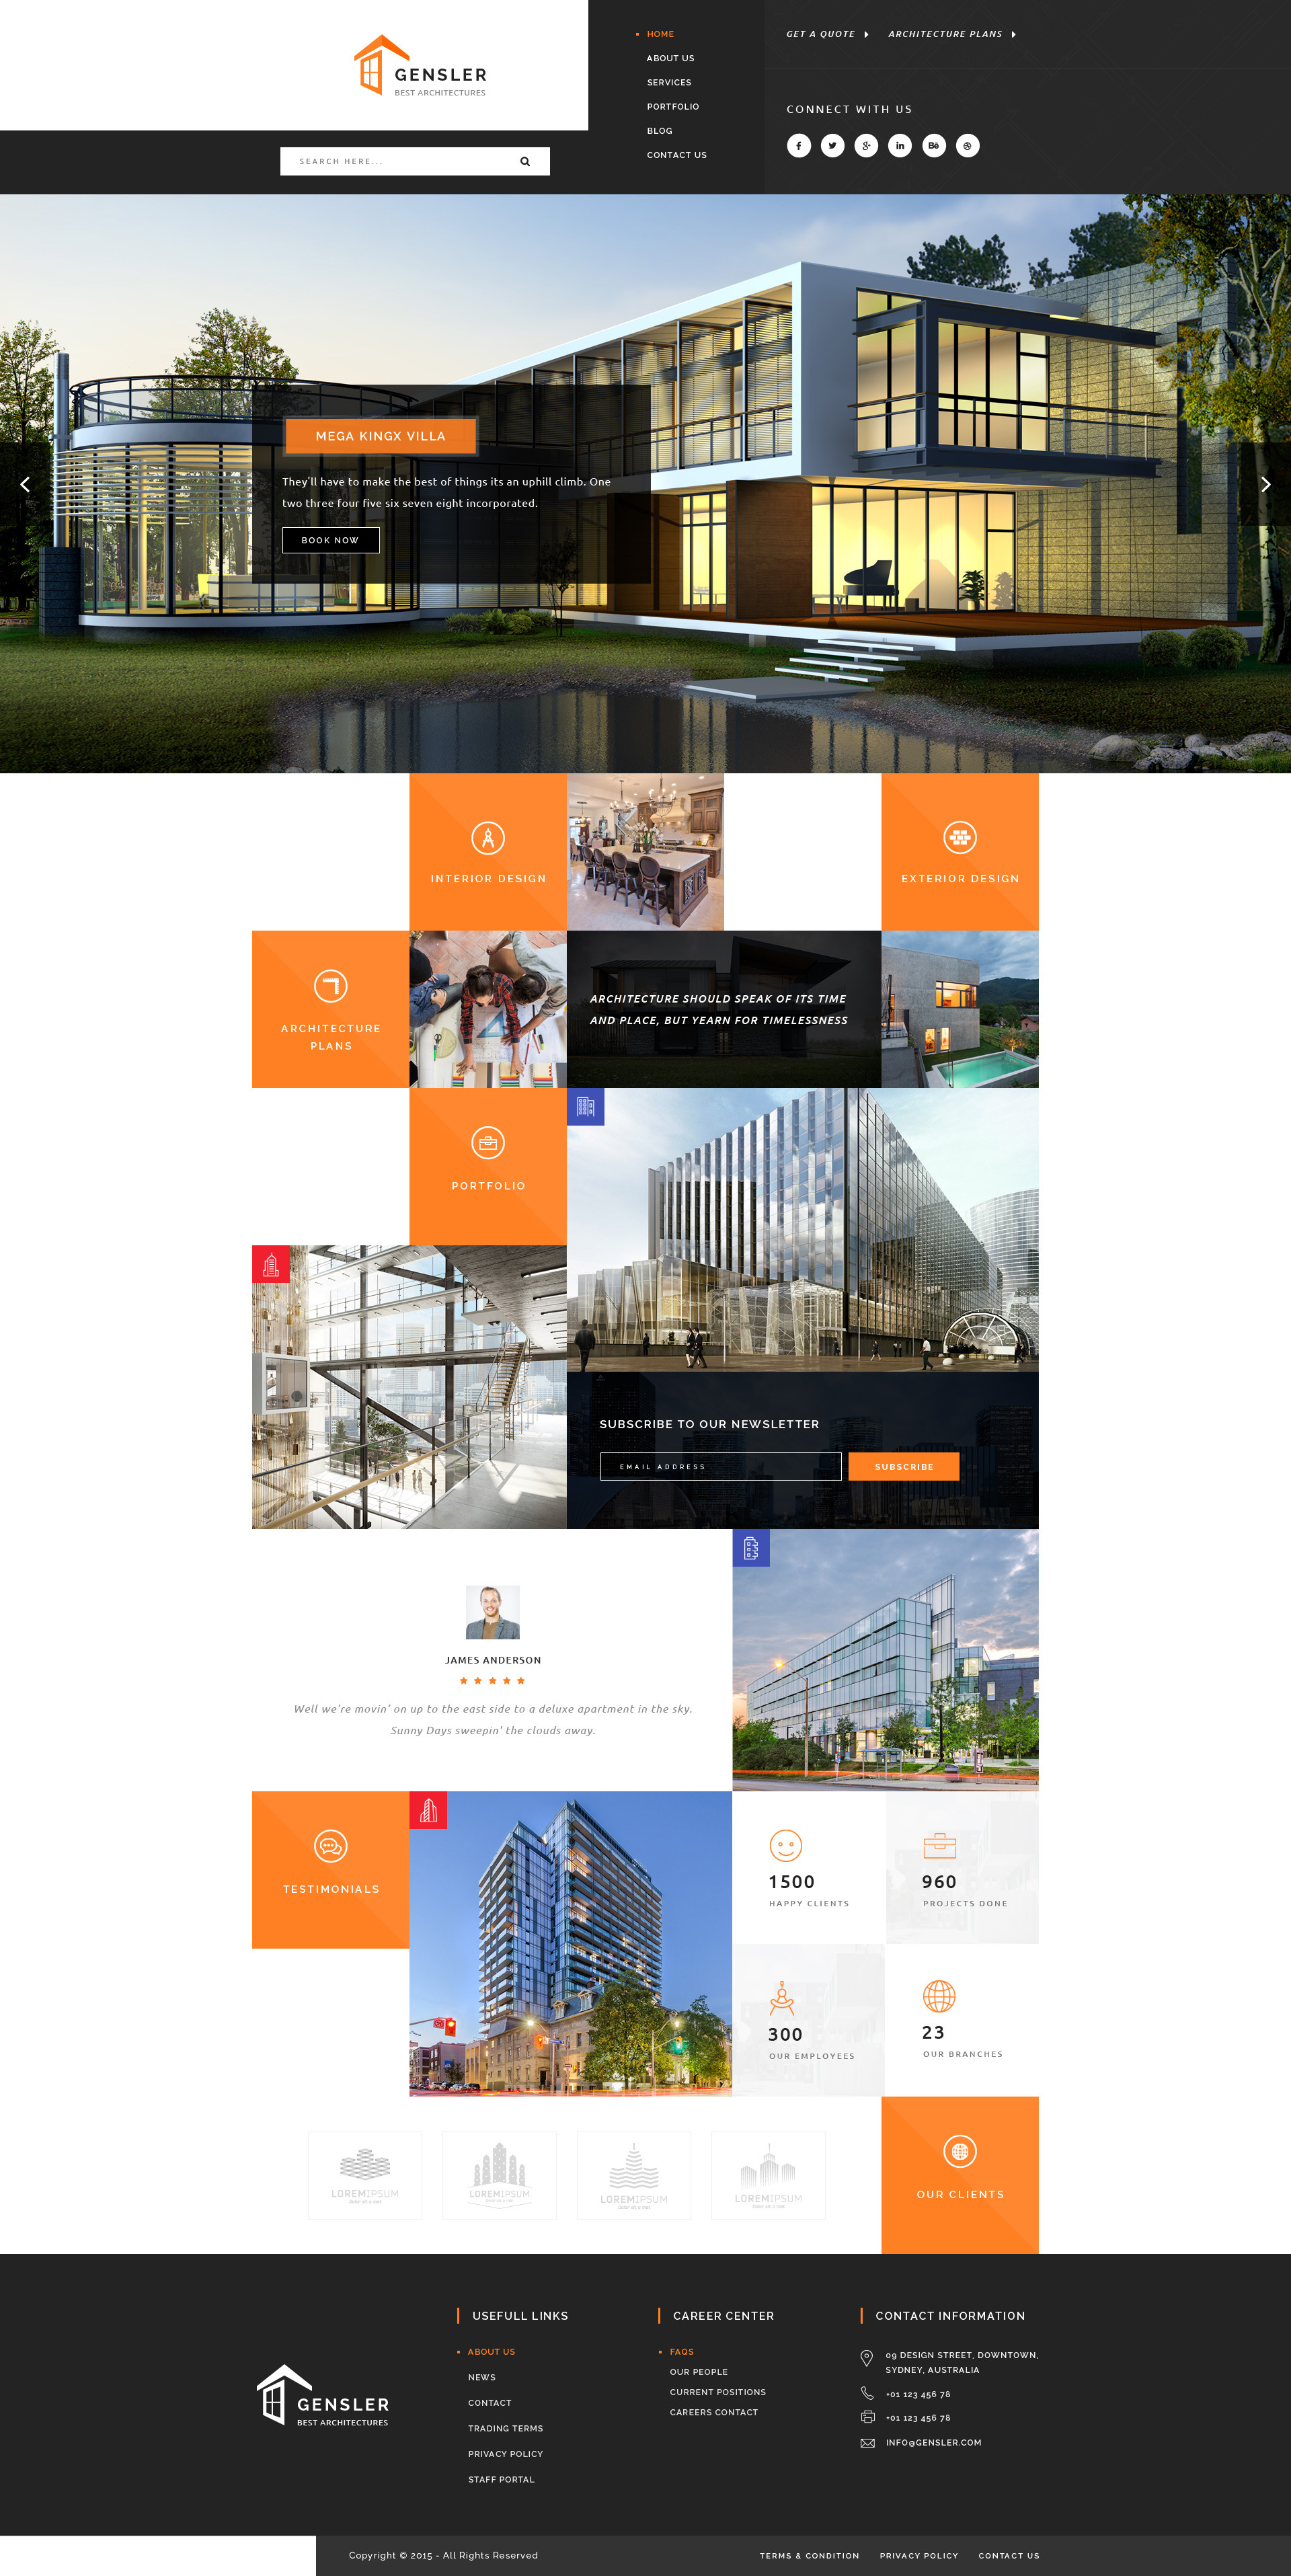 Gensler : Architecture PSD Template by PremiumWebs | ThemeForest